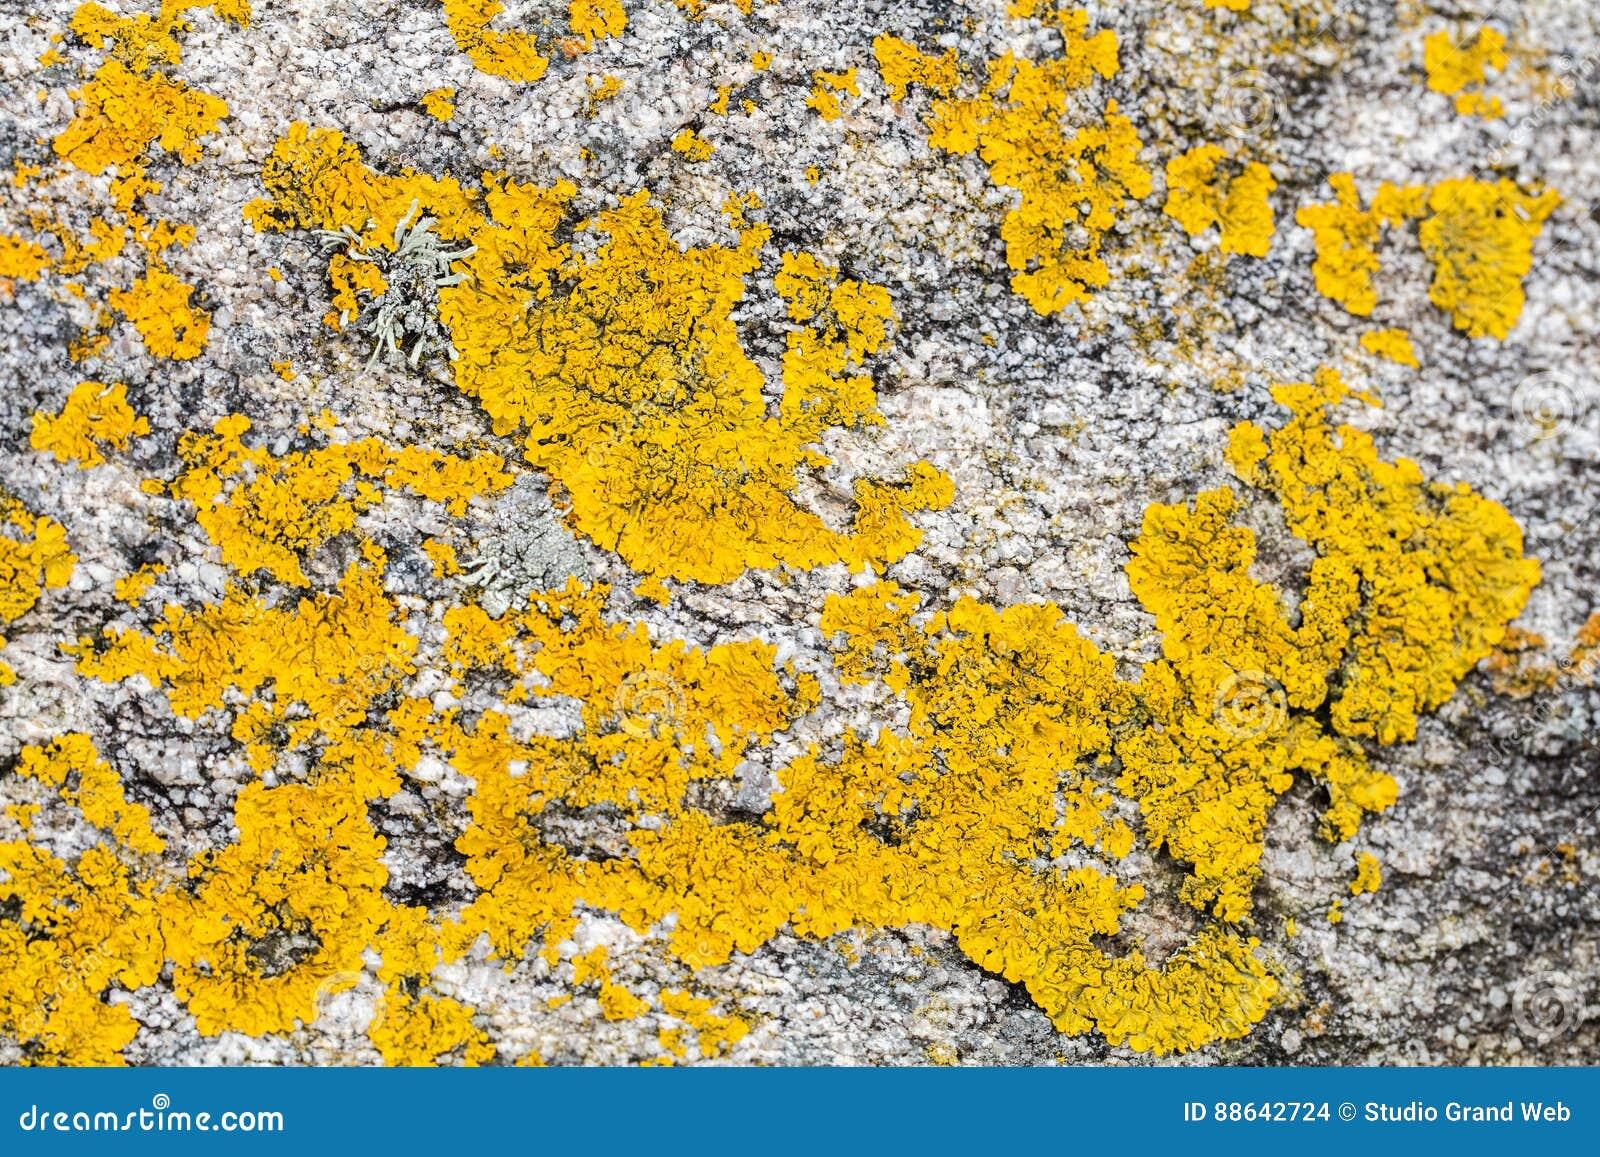 Mustard Yellow Saxilocous Caloplaca Moss Or Lichen For Natural P